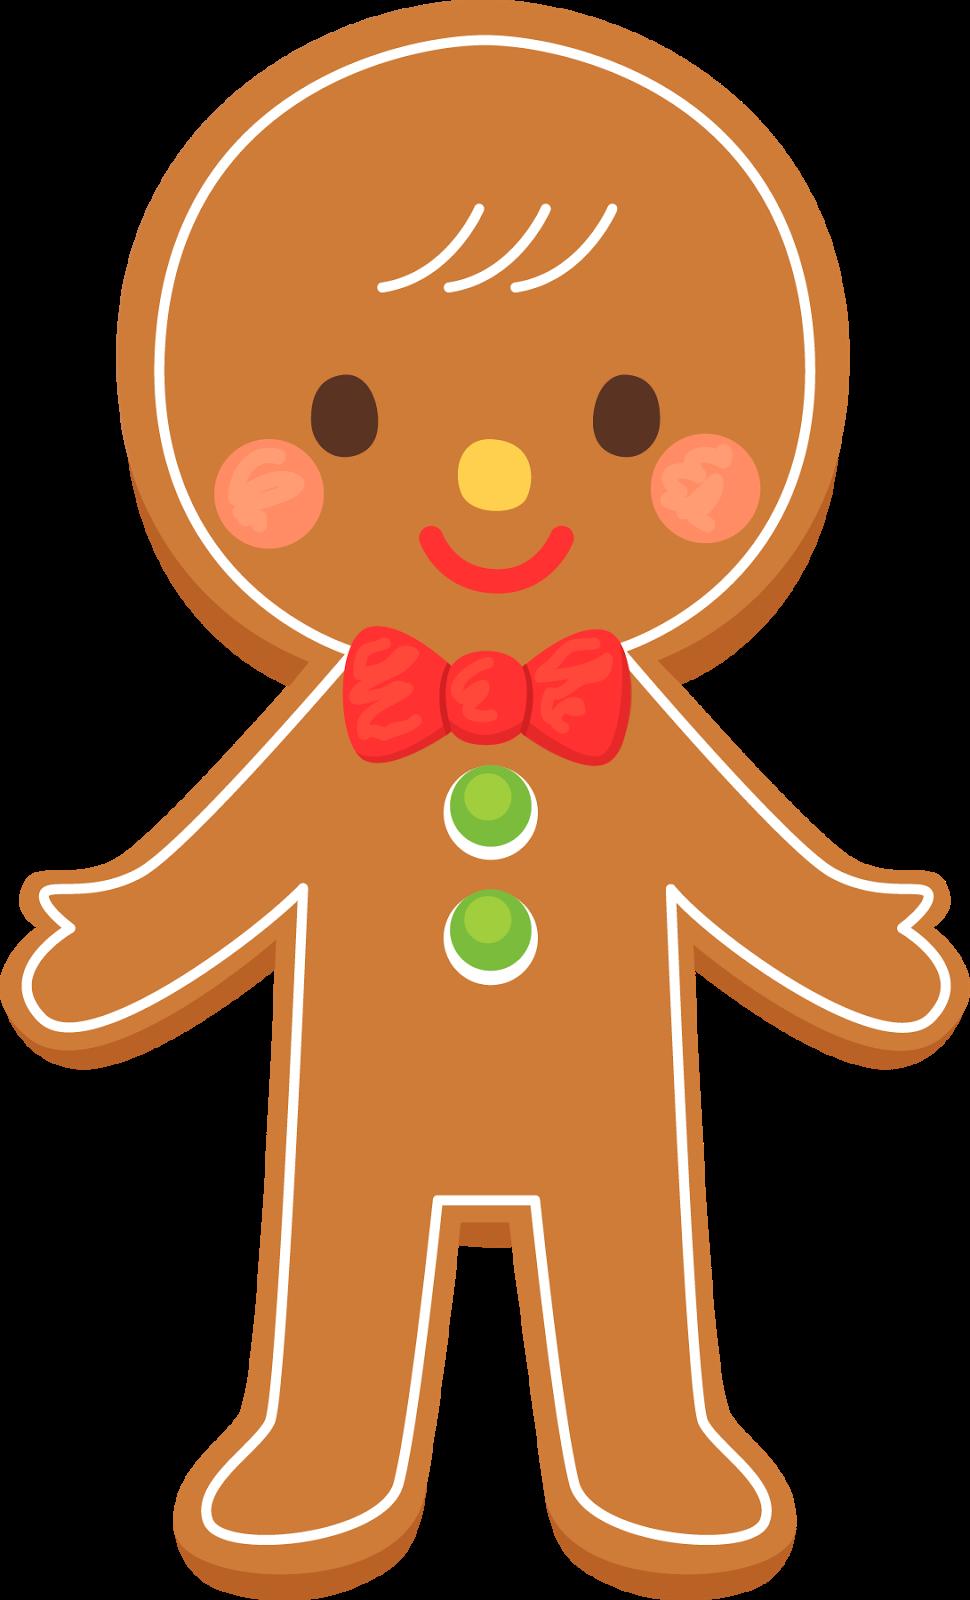 Christmas gingerbread man clip art clip art gingerbread image 4.